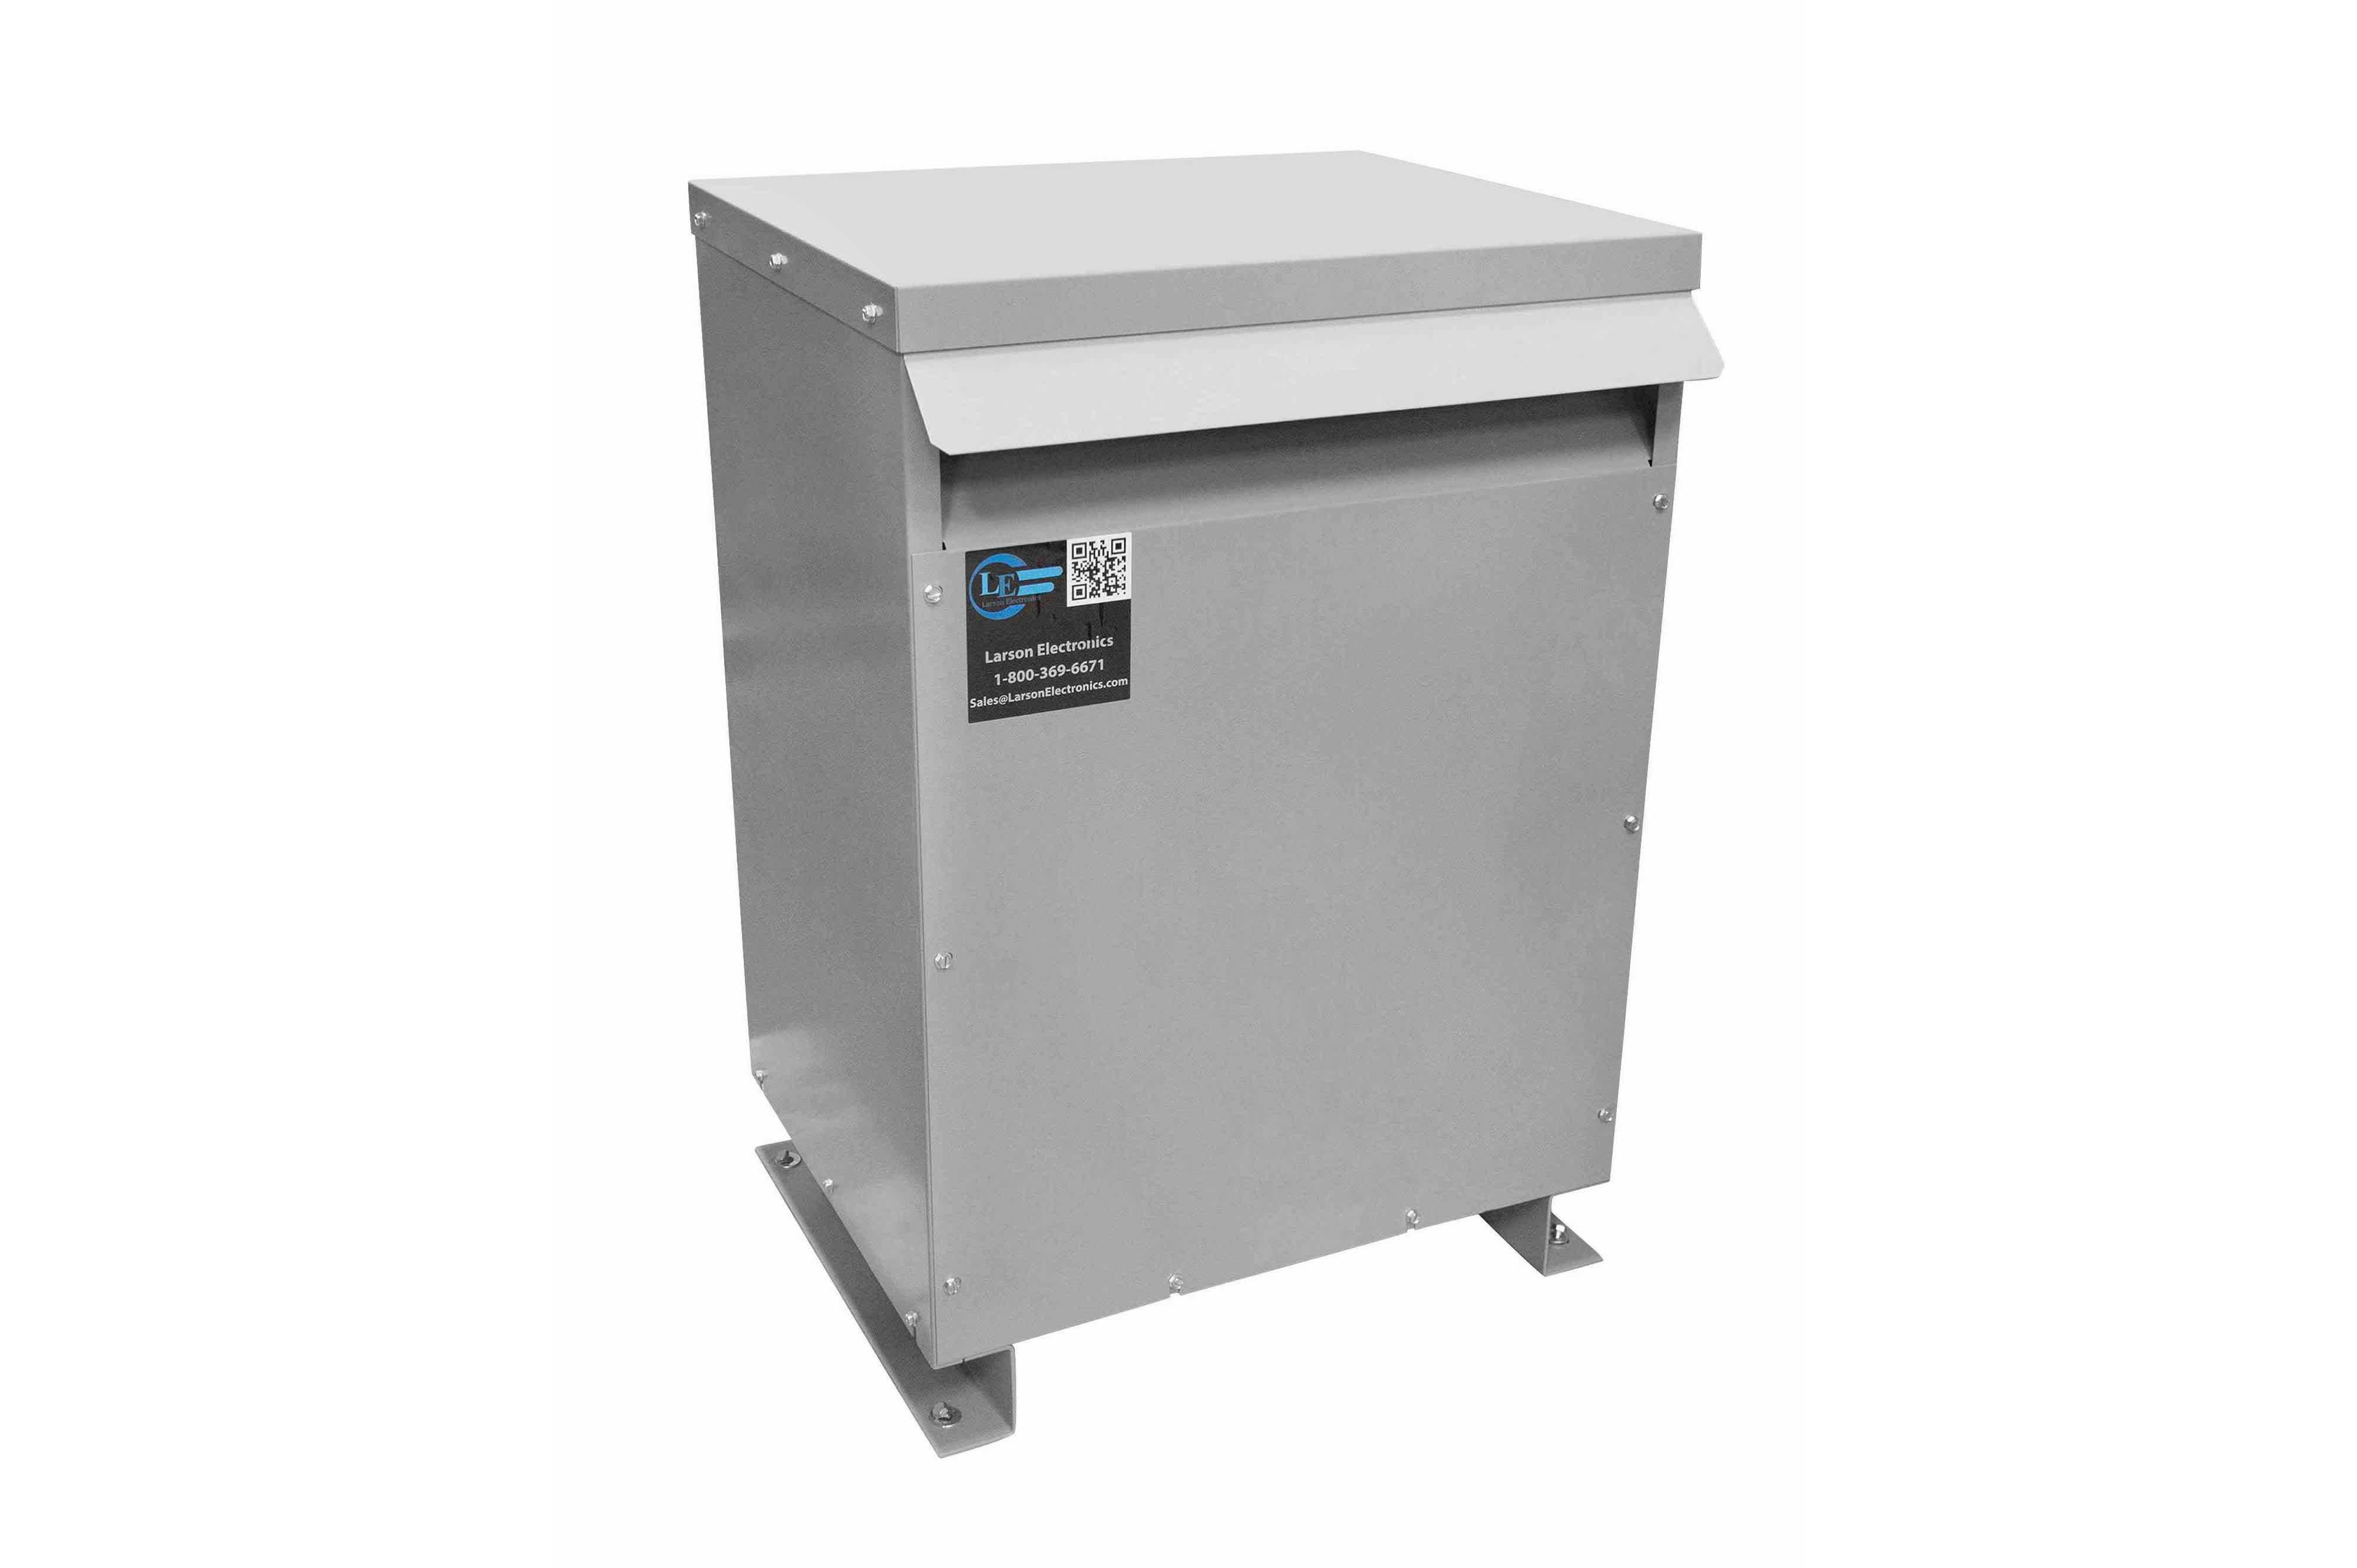 42.5 kVA 3PH Isolation Transformer, 415V Wye Primary, 240V Delta Secondary, N3R, Ventilated, 60 Hz